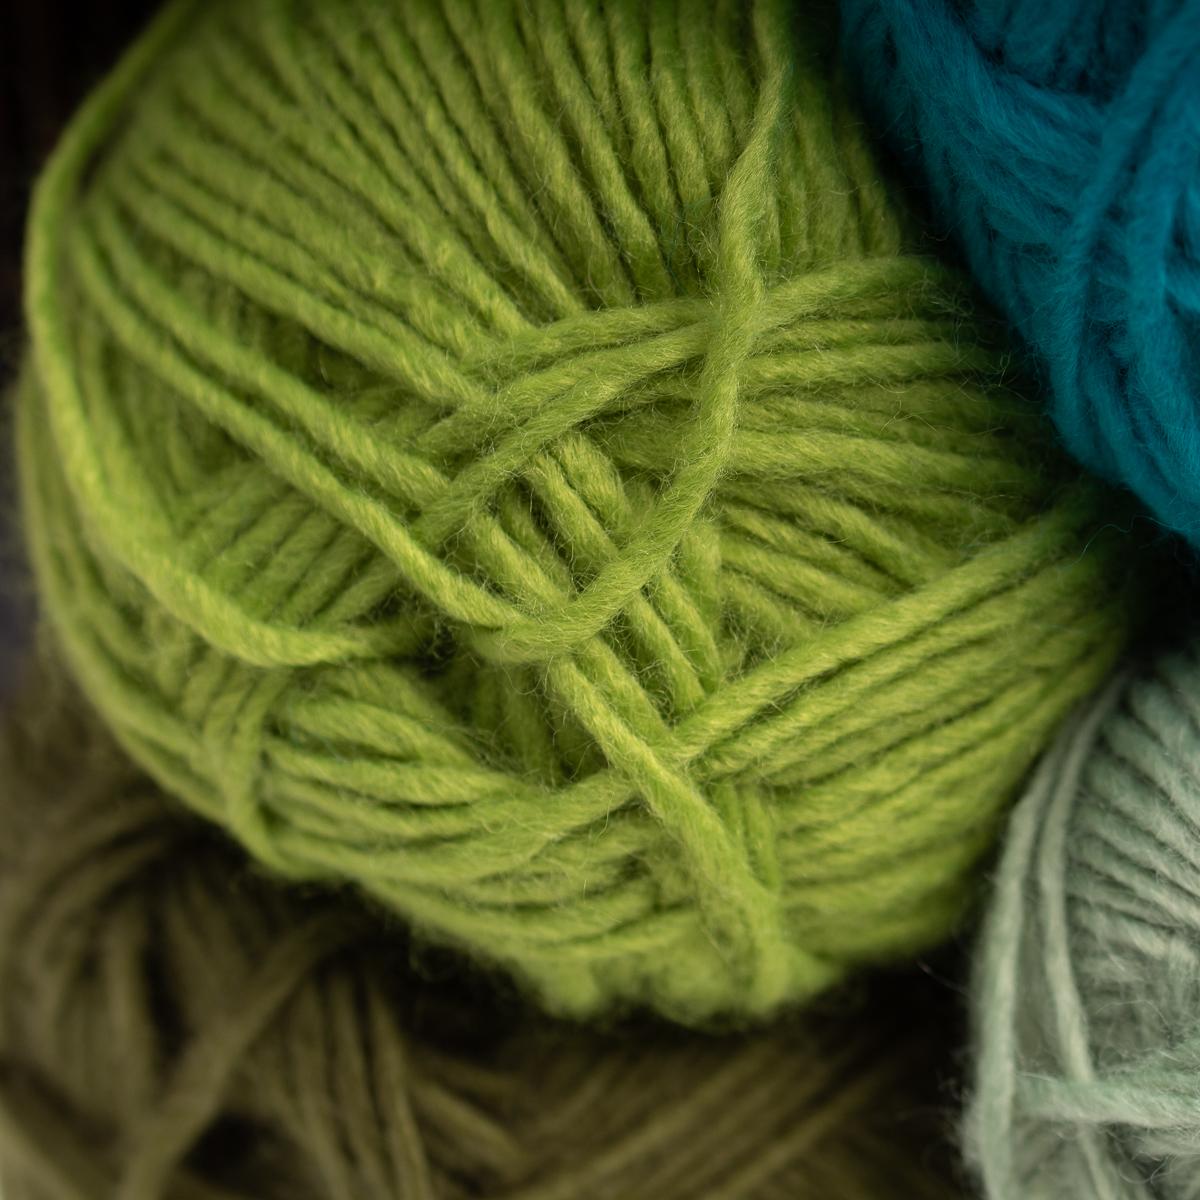 3pk-Lion-Brand-New-Basic-Acrylic-amp-Wool-Yarn-Medium-4-Knit-Crochet-Skeins-Soft thumbnail 46